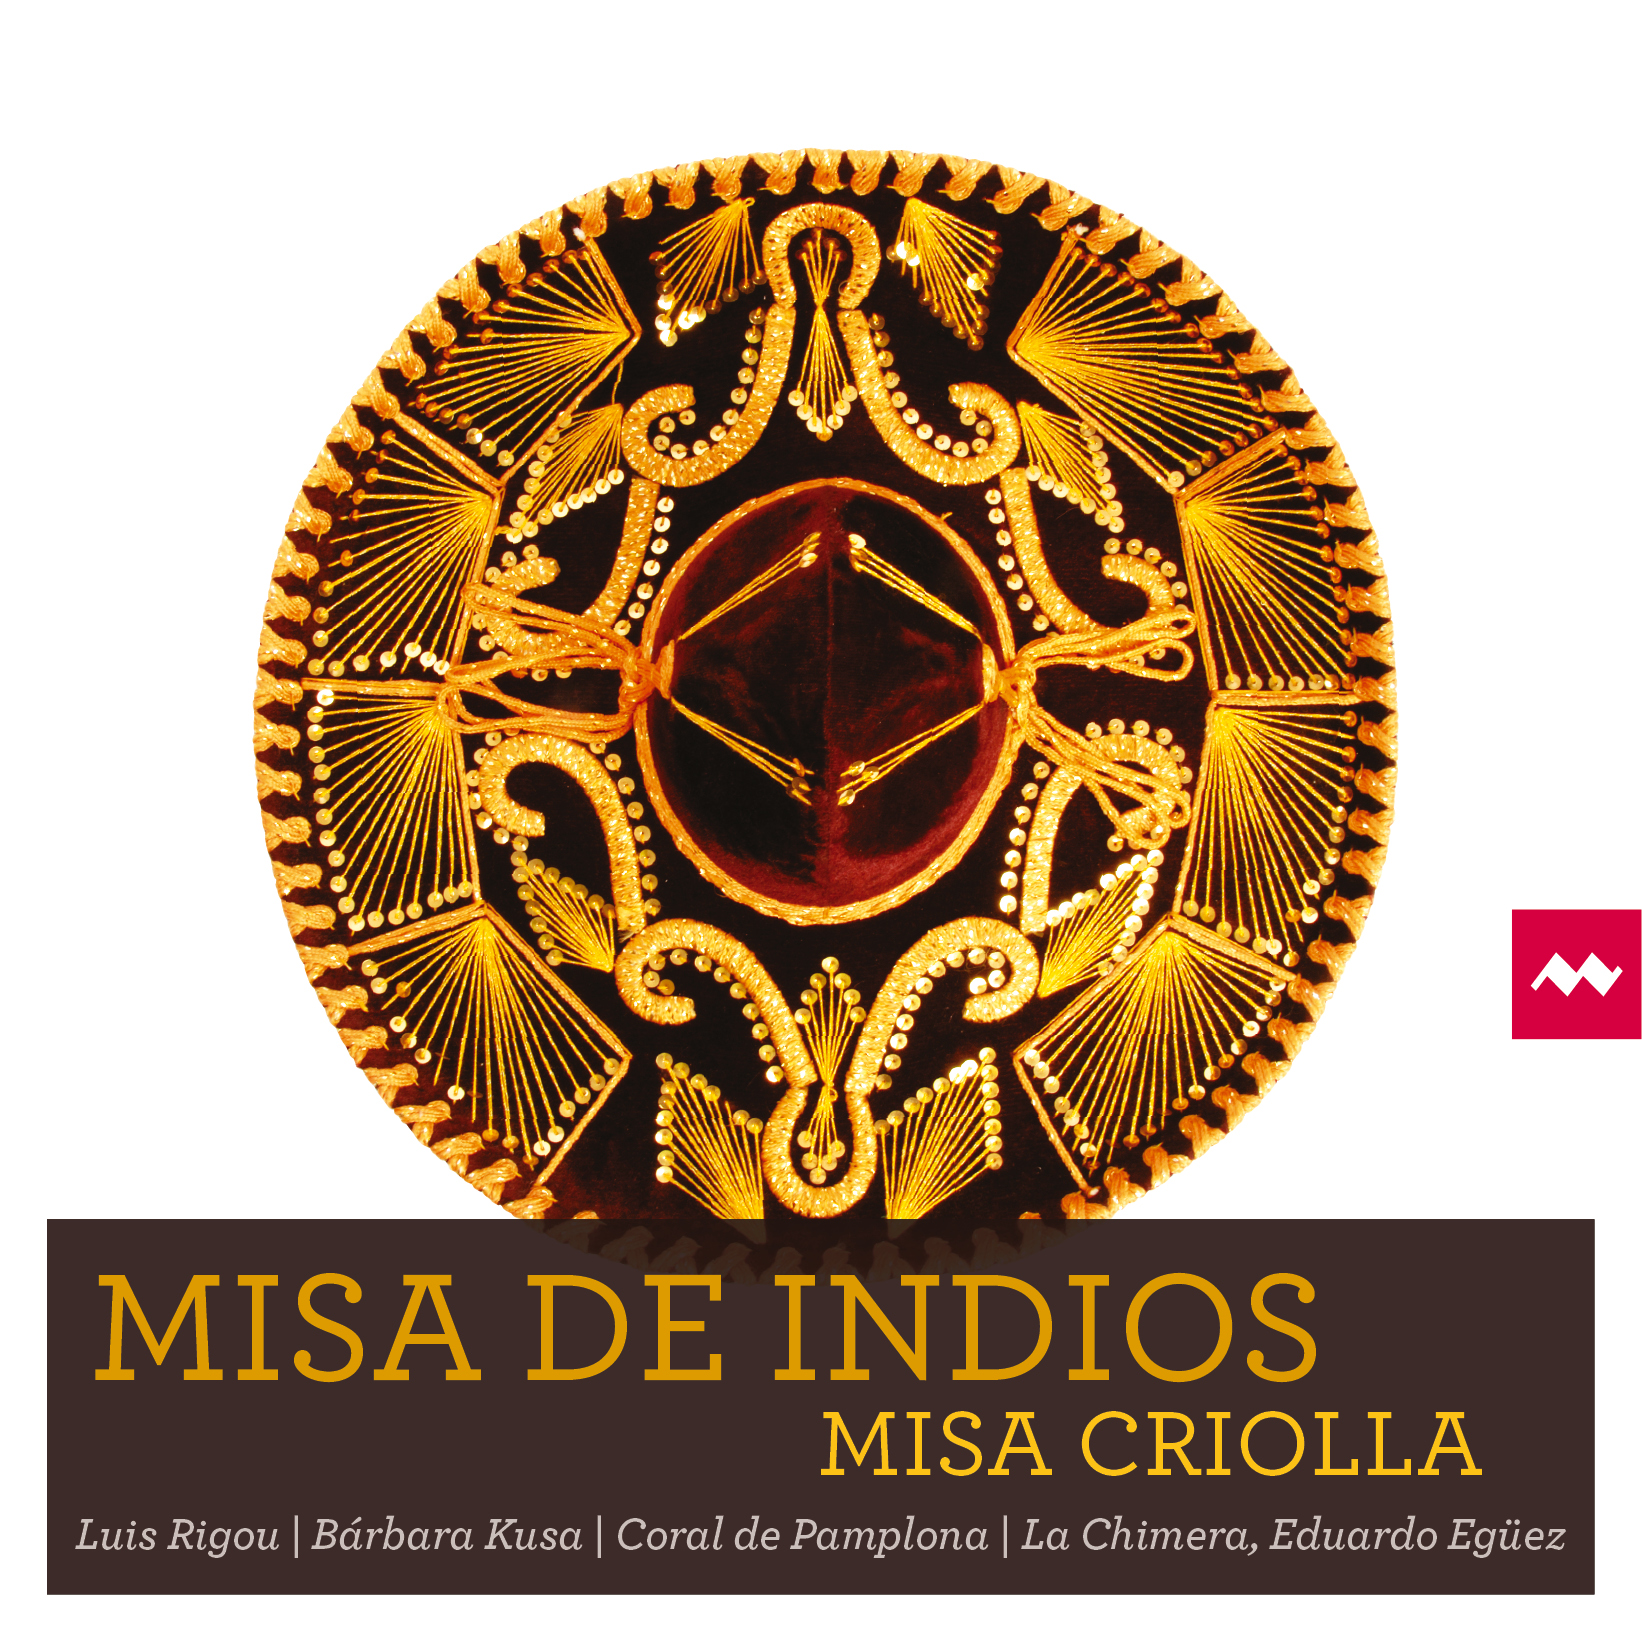 Misa de Indios - Misa Criolla, La Chimera & Eduardo Egüez Image